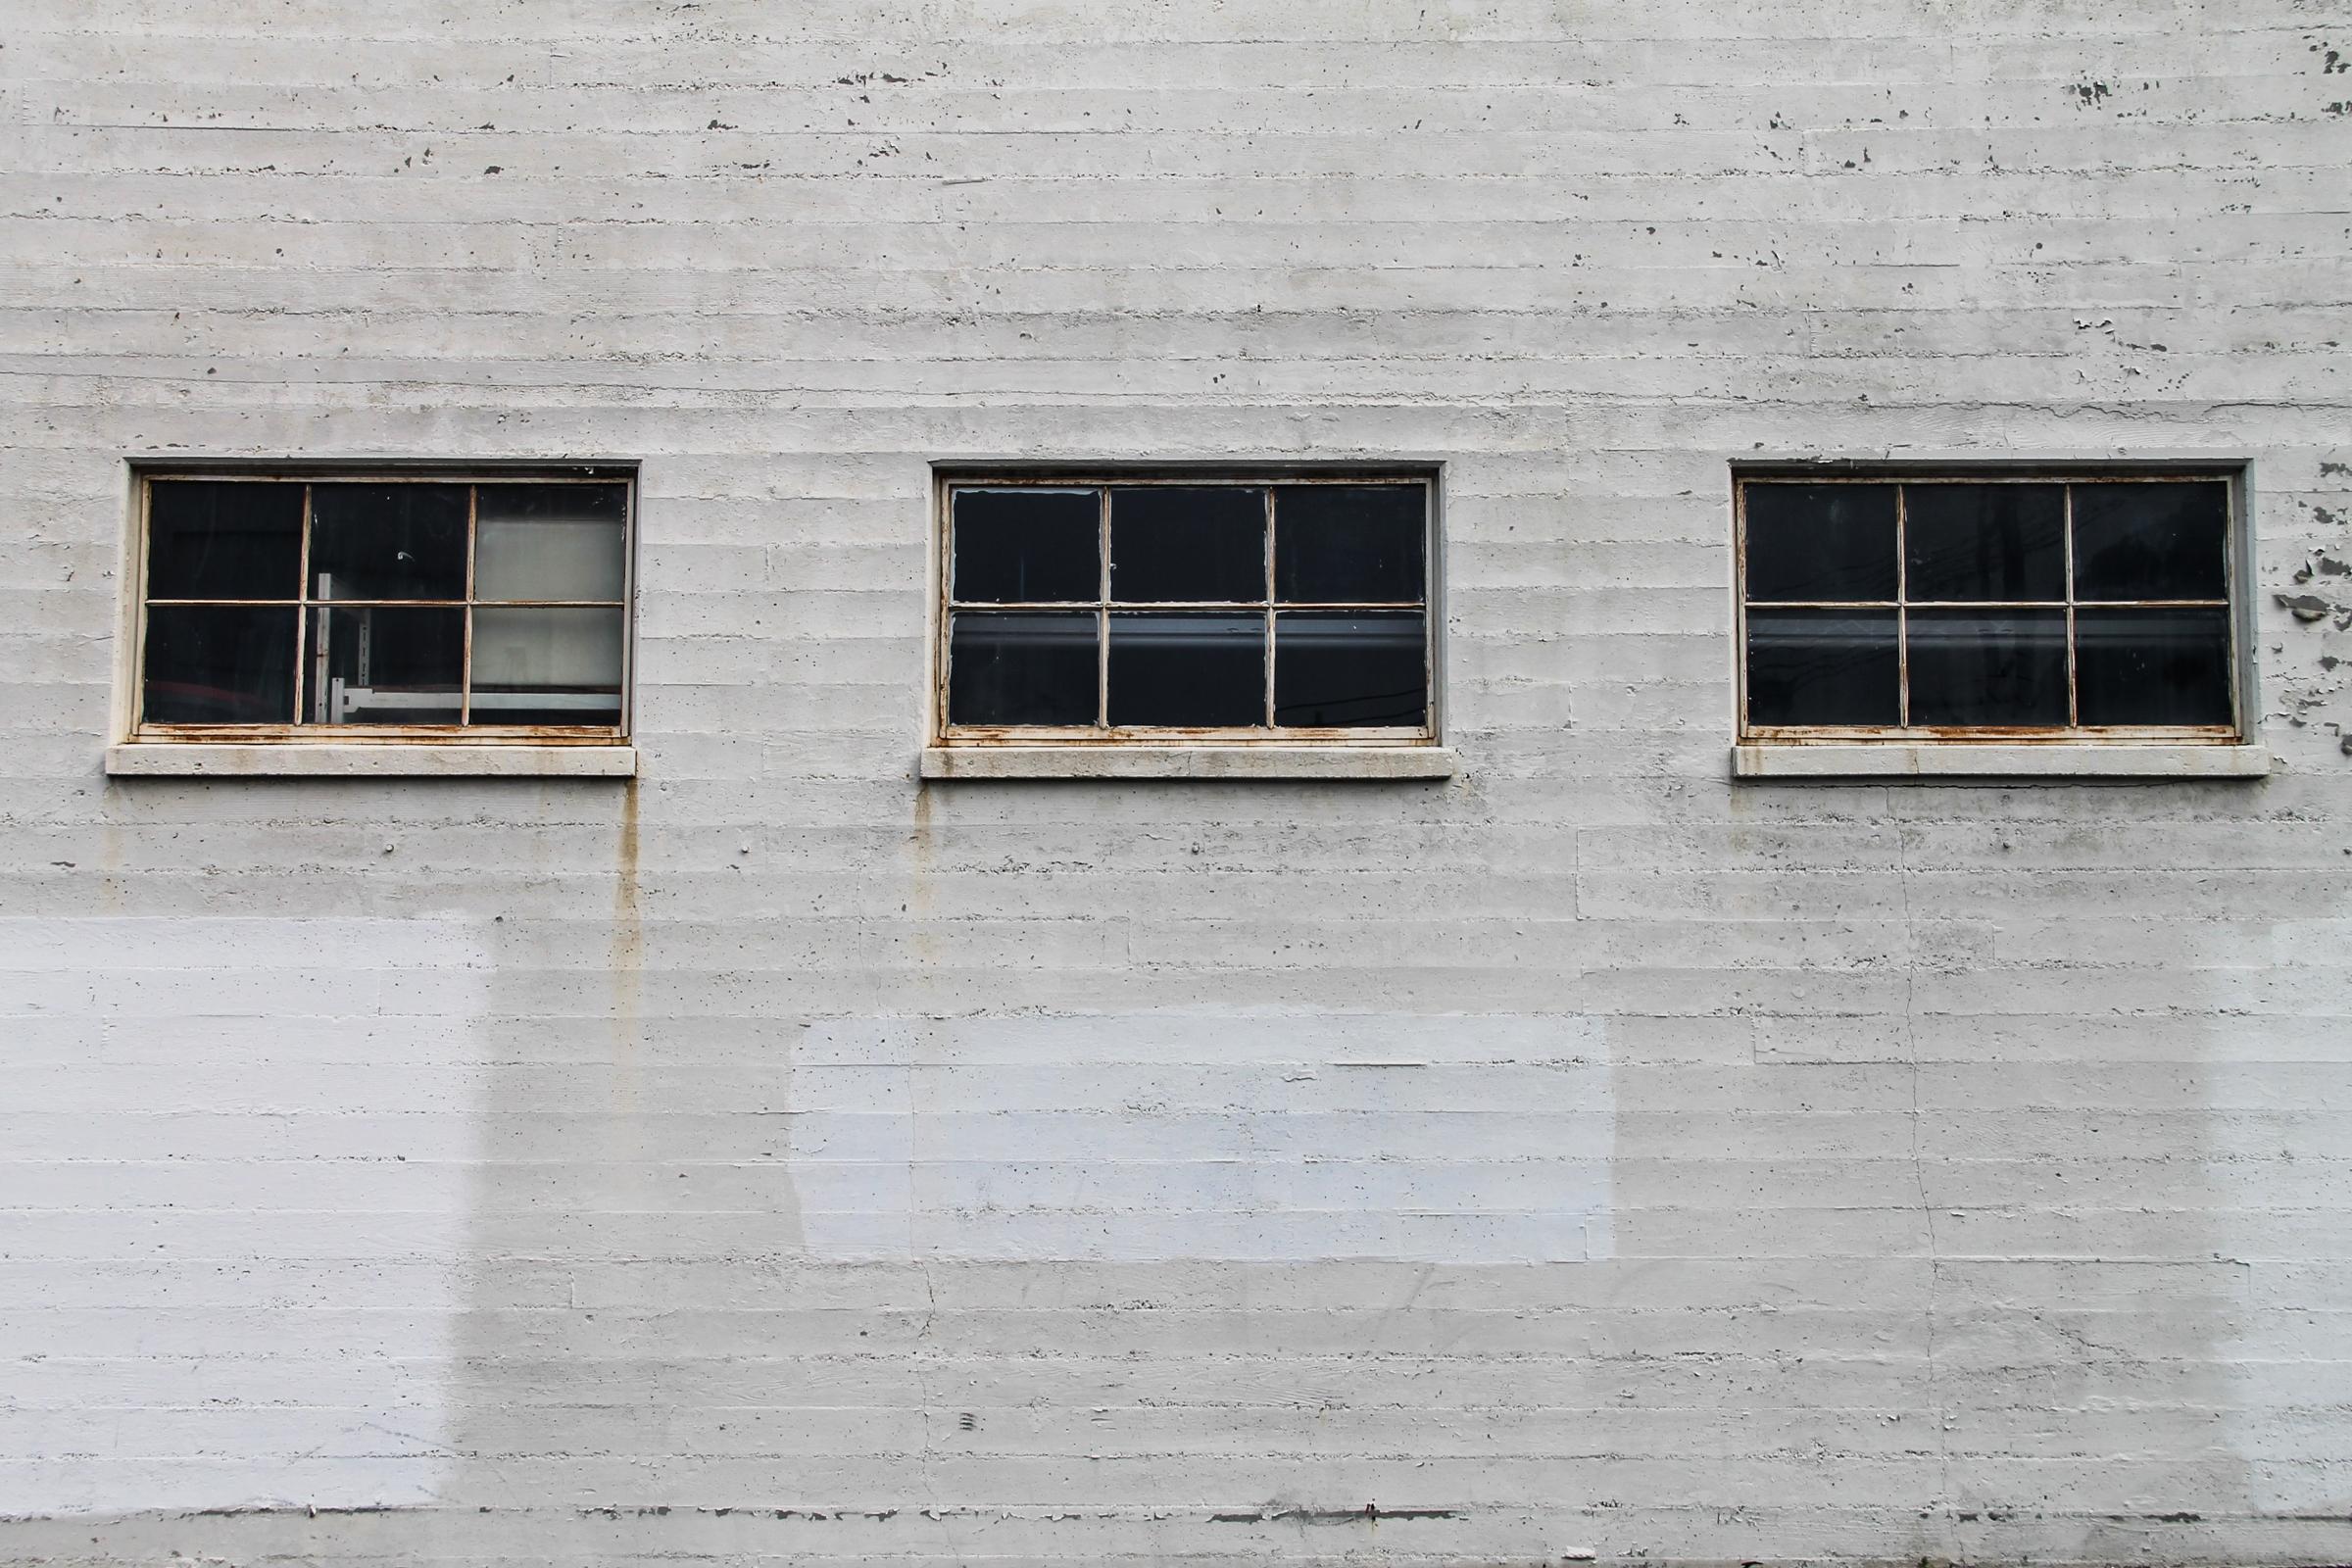 Free Stock Photo of 3 Windows on White Brick Building